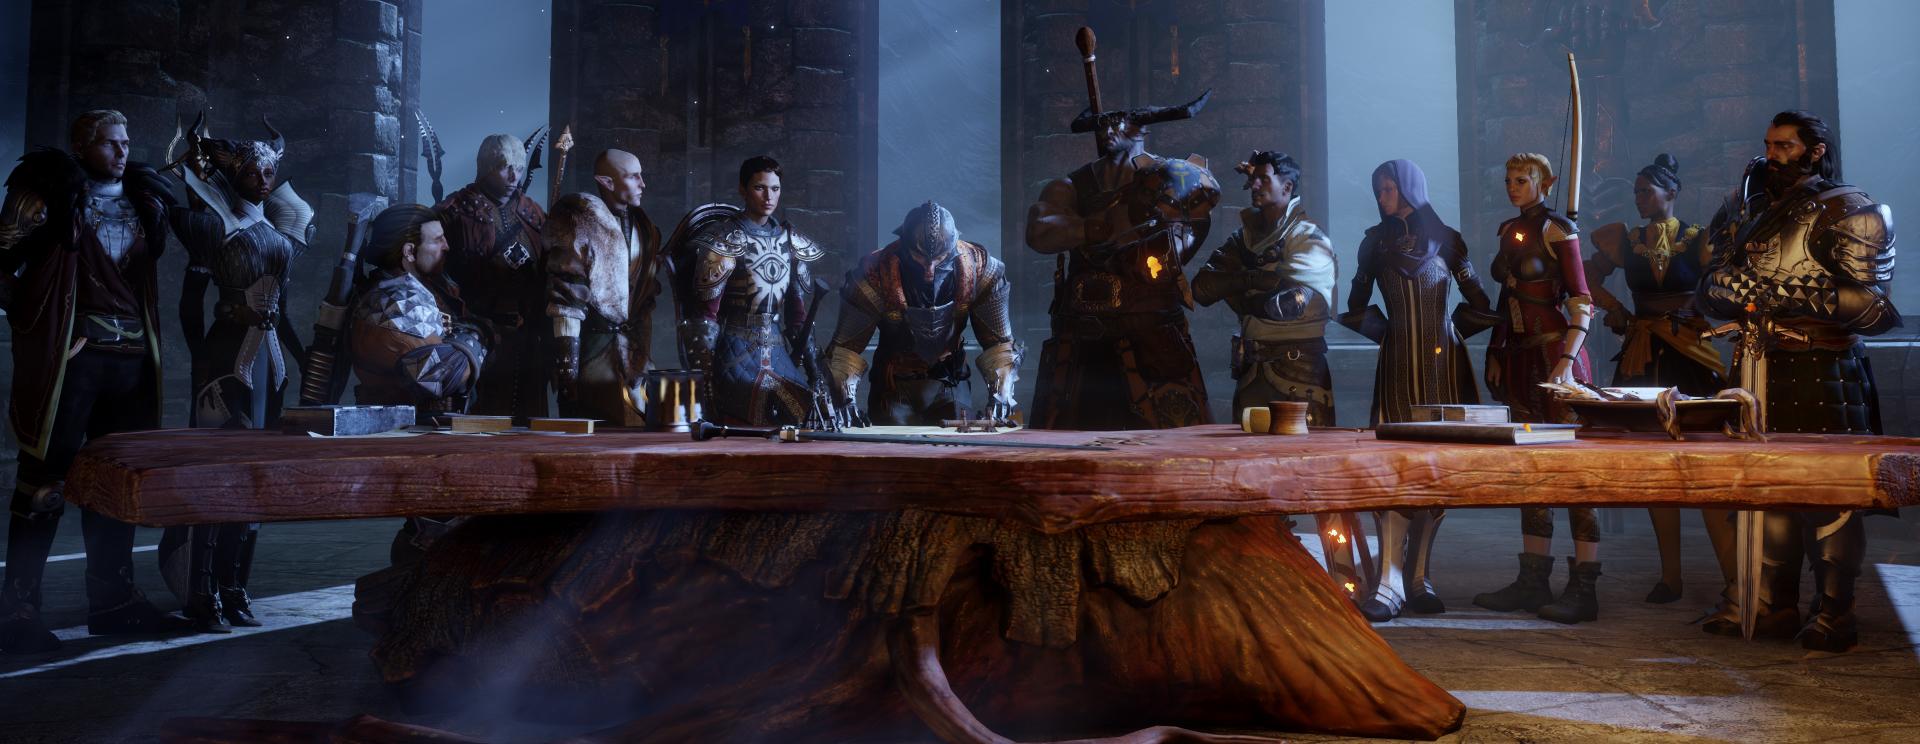 Inquisition Dragon Age Wiki Fandom Powered By Wikia